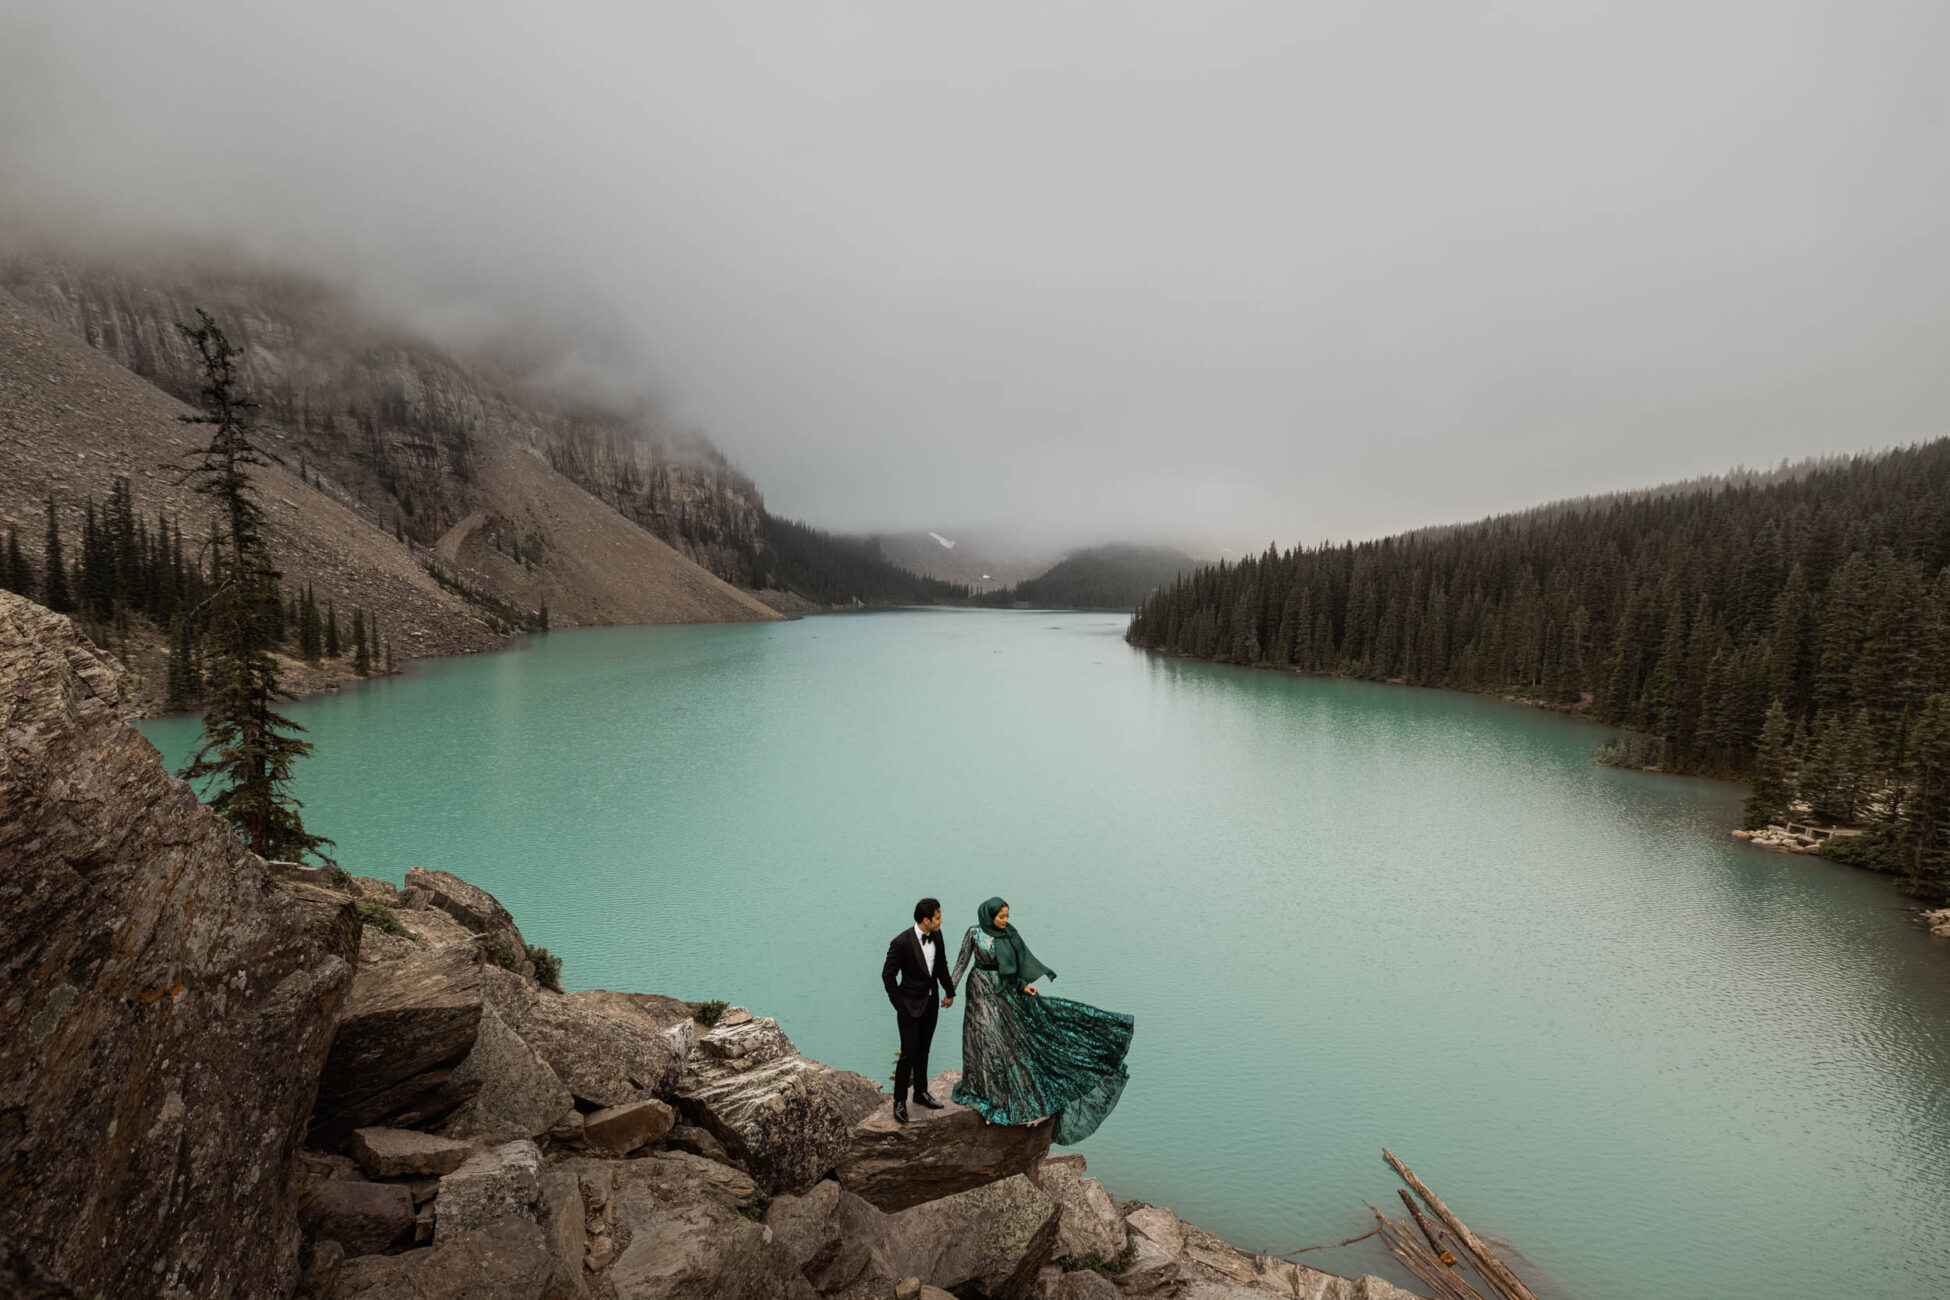 moody wedding photos in banff national park